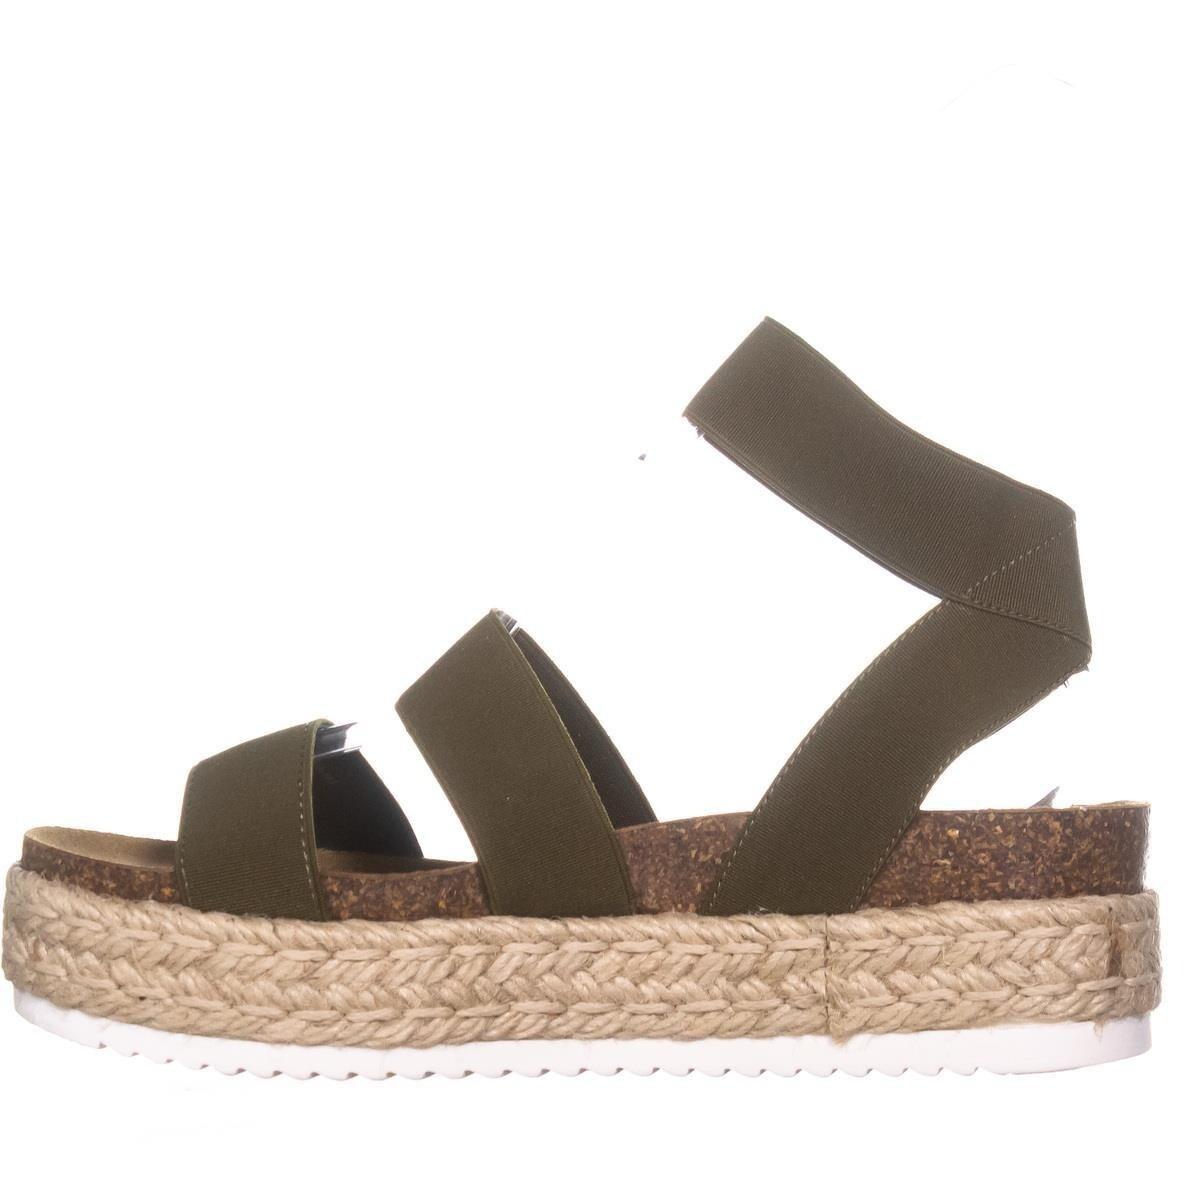 e01a9688a44 Shop Steve Madden Kimmie Espadrille Wedge Sandals